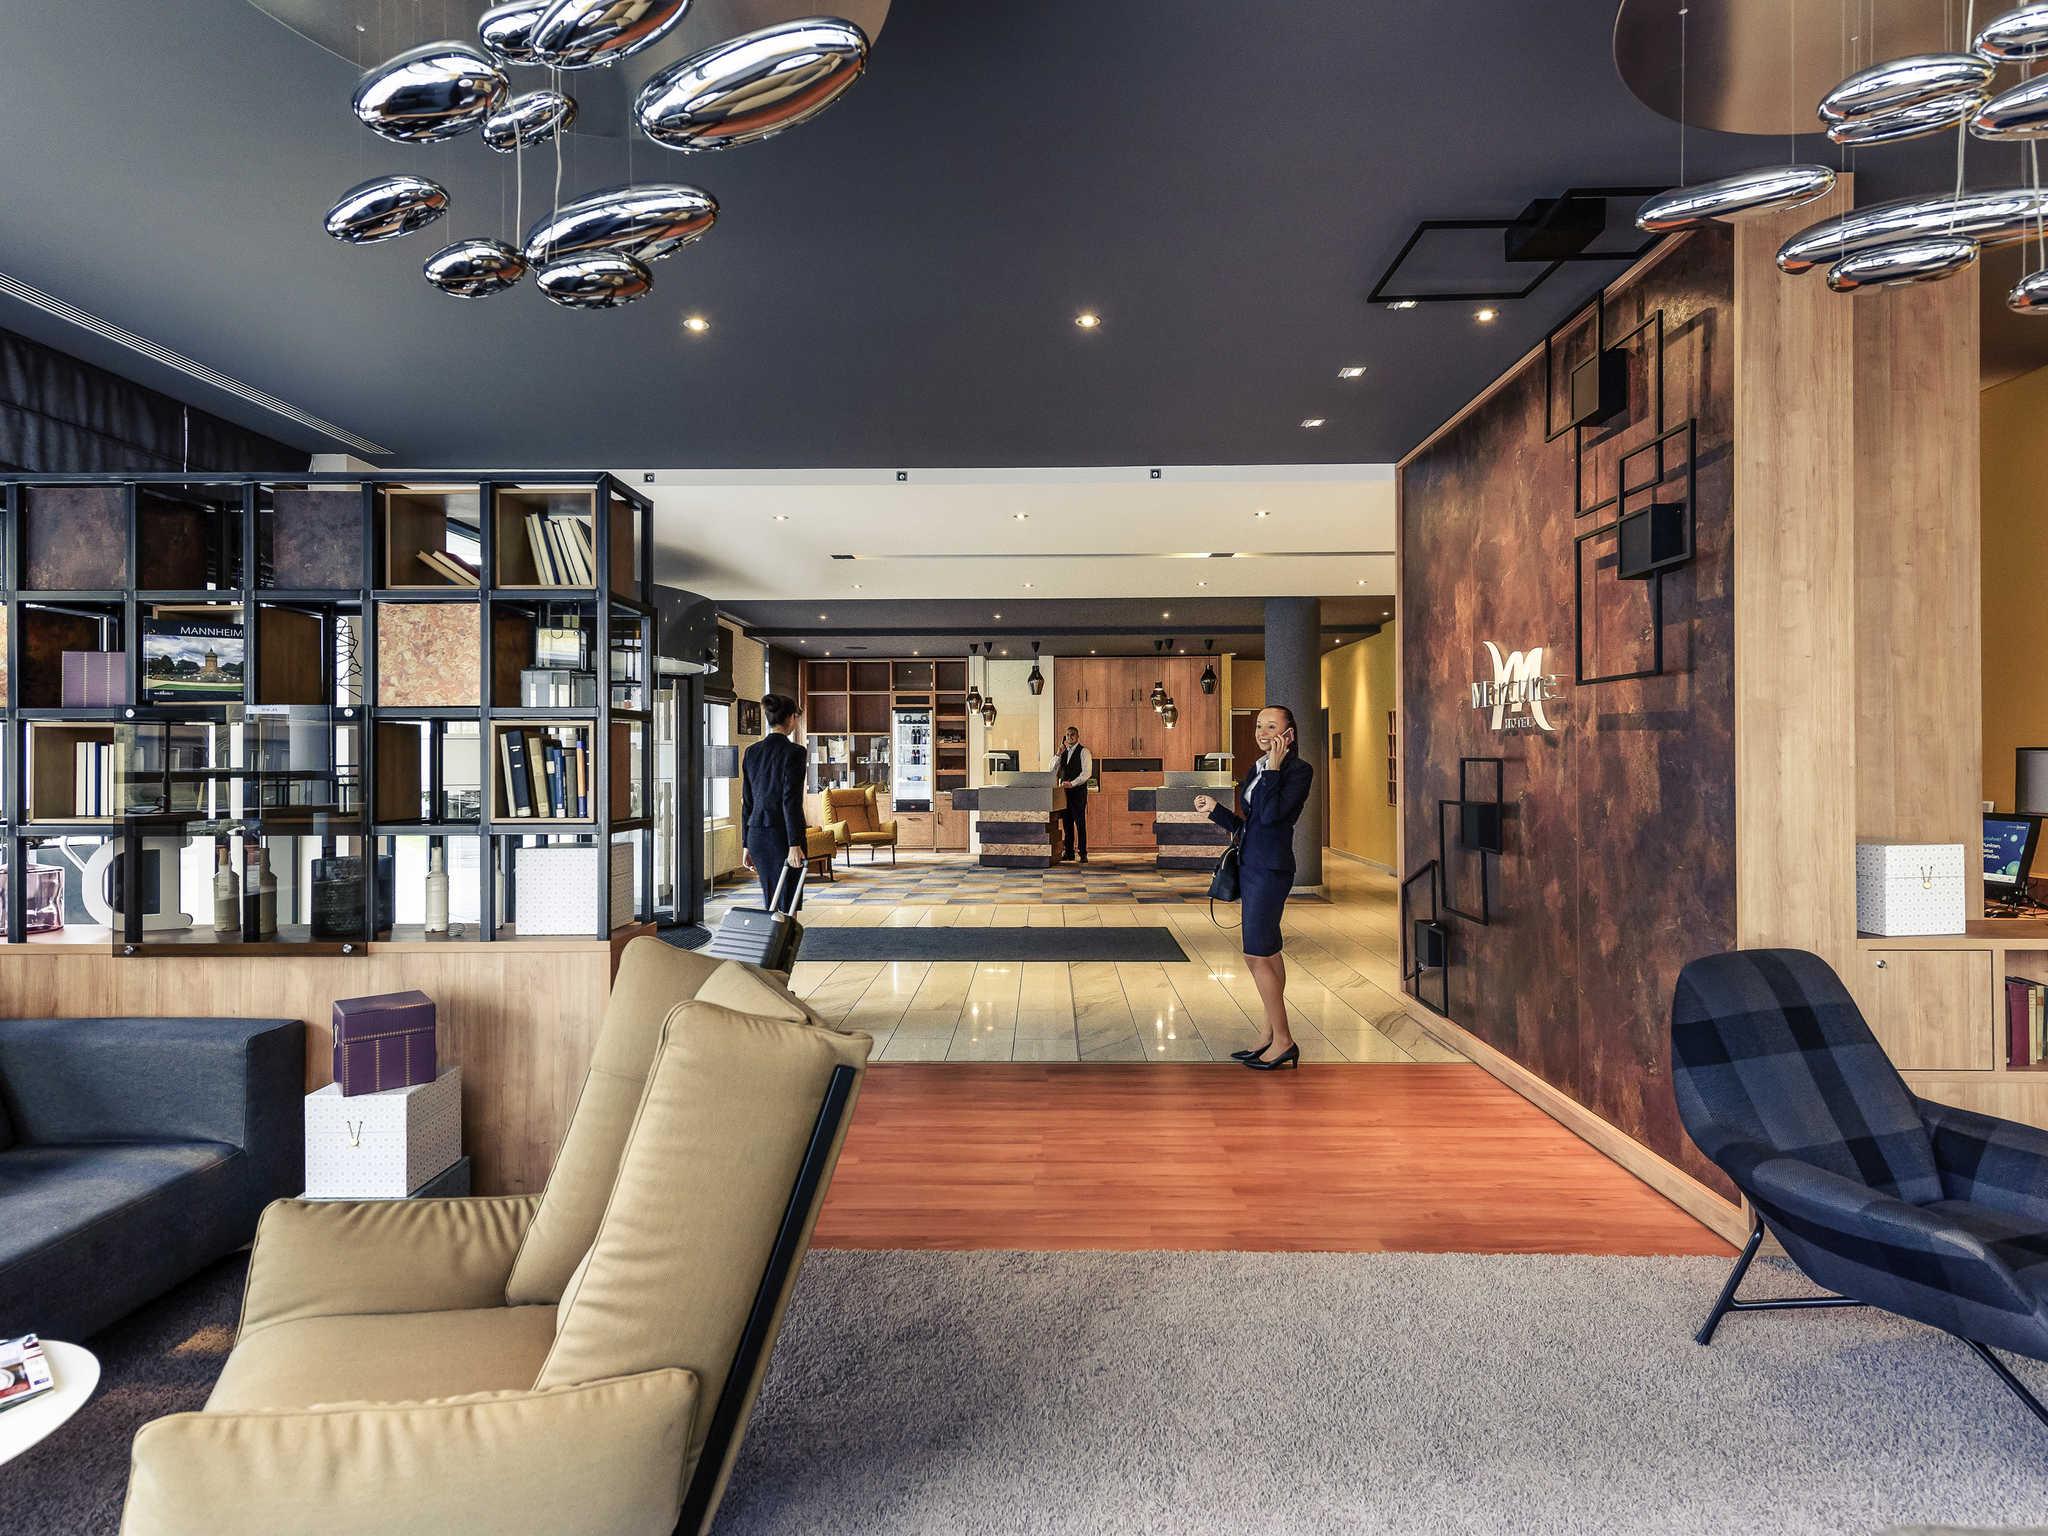 Hotel – Mercure Hotel Mannheim am Rathaus